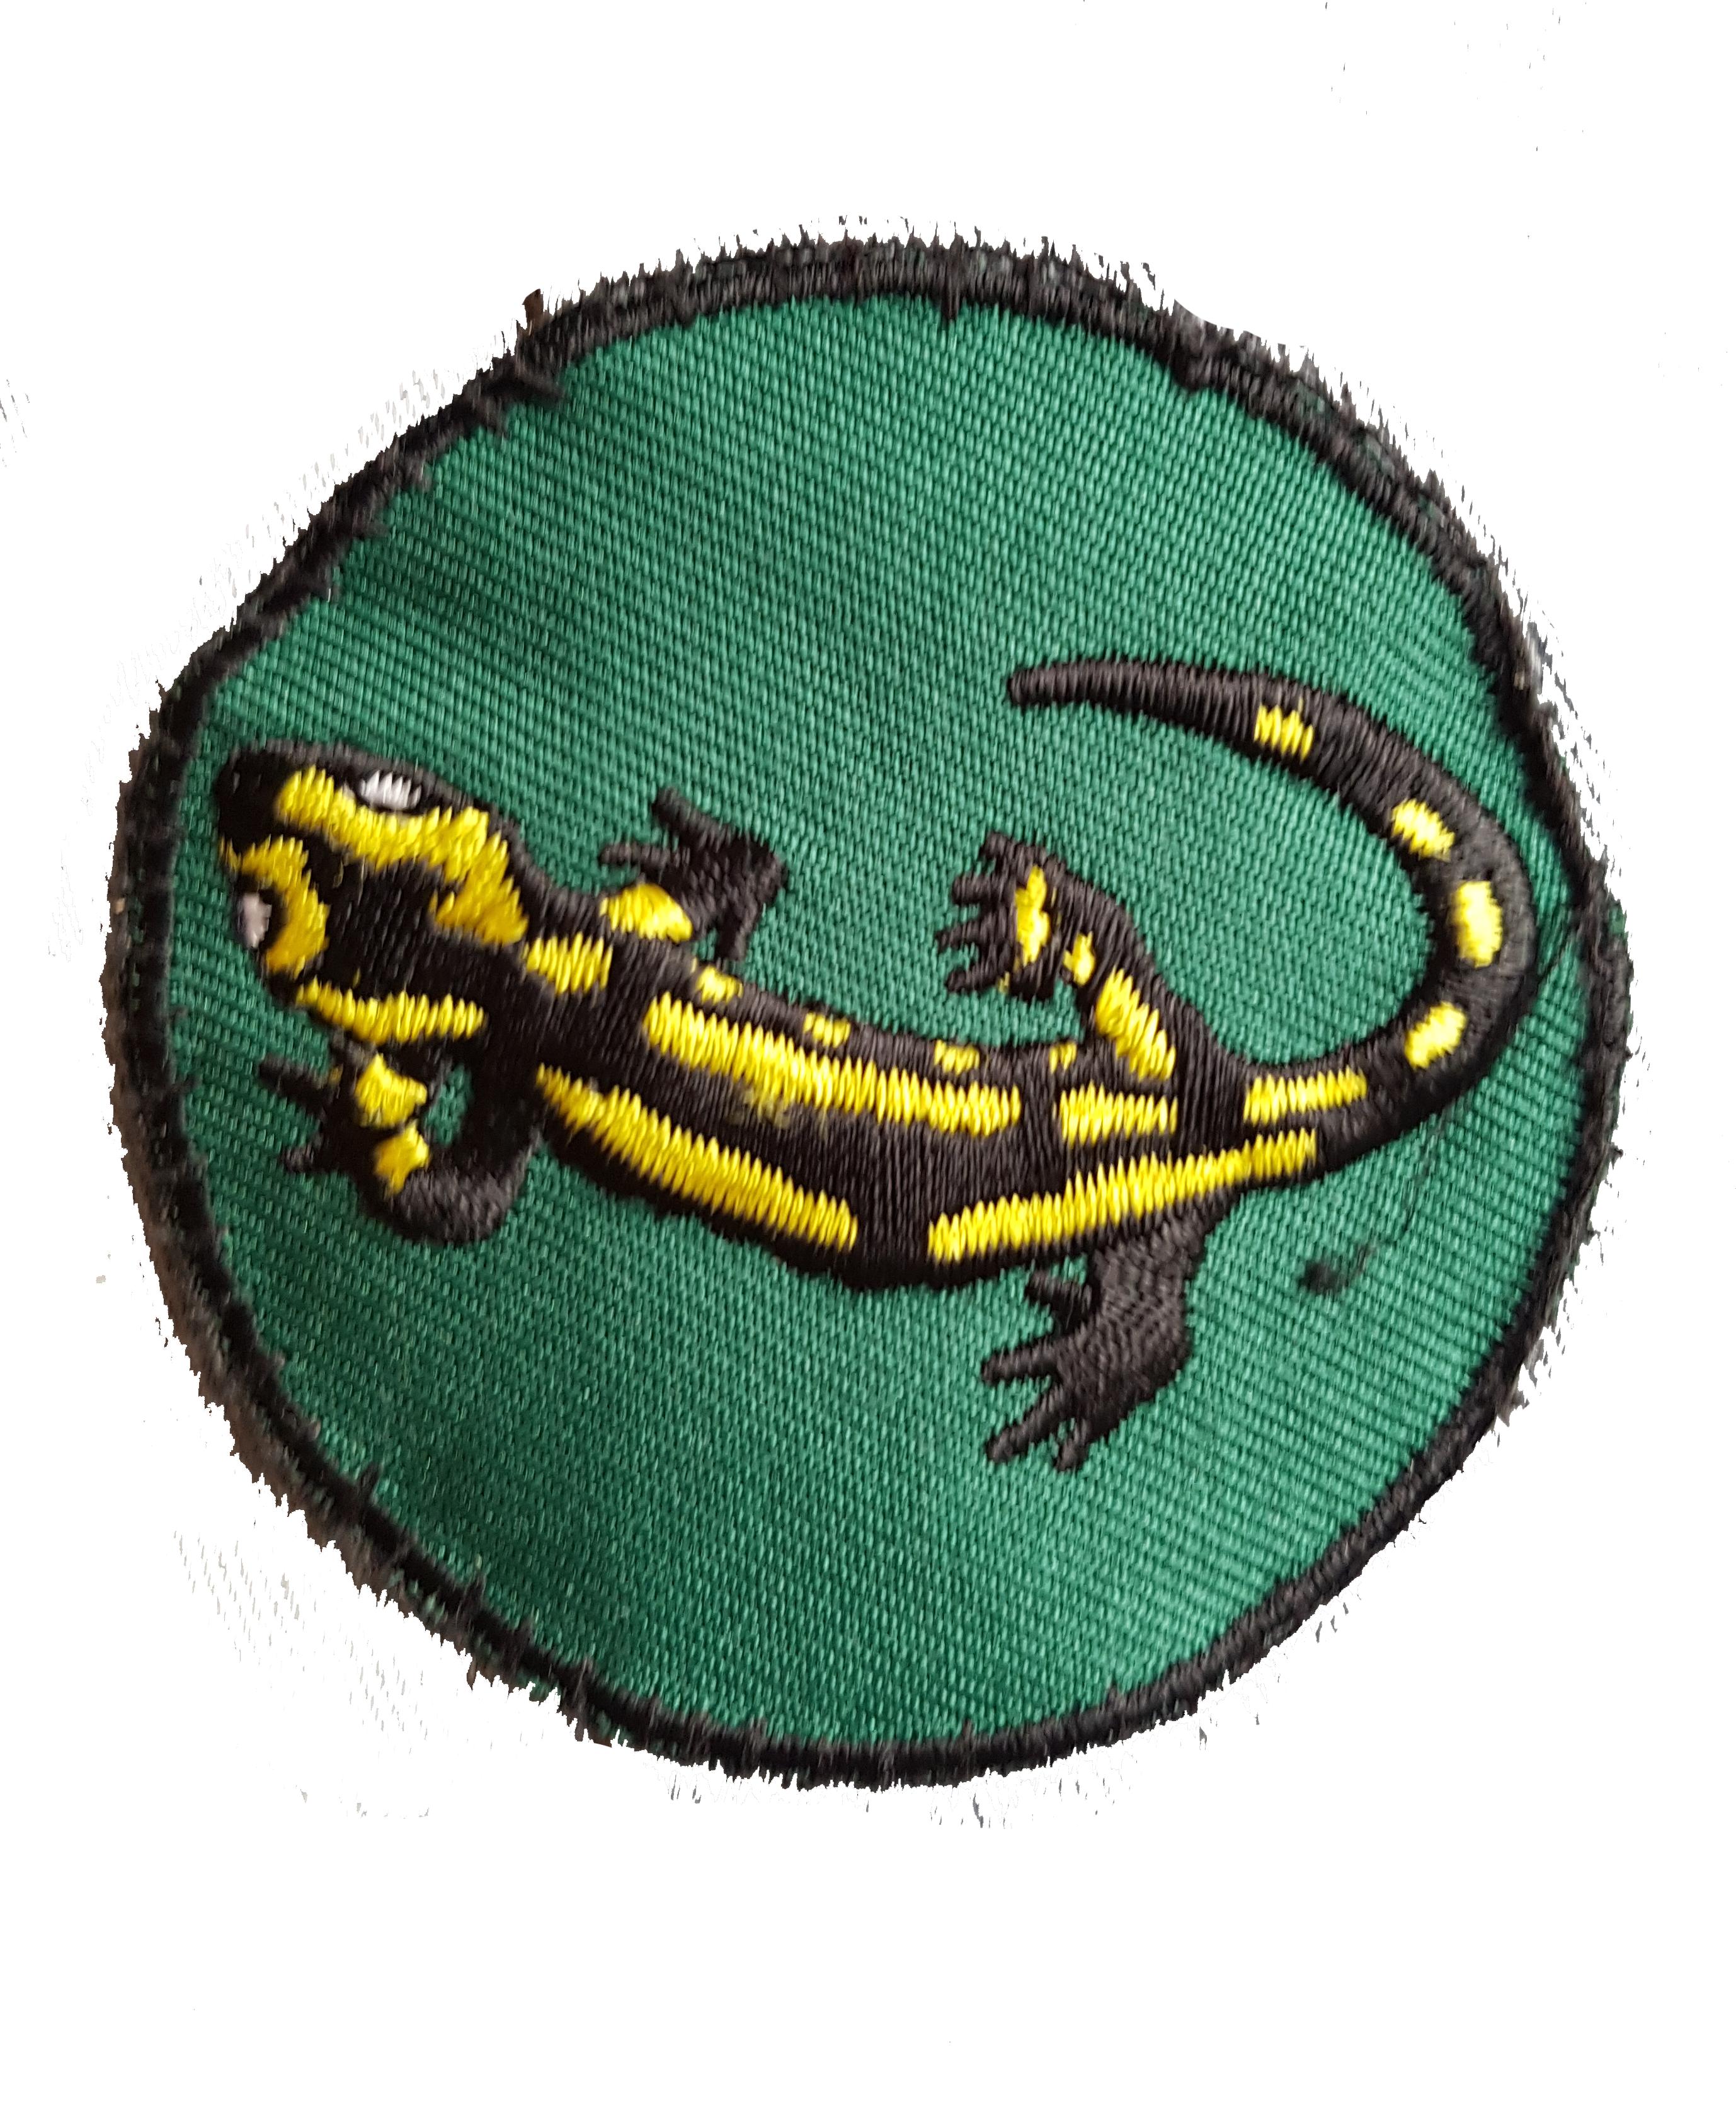 roverclan_salamander